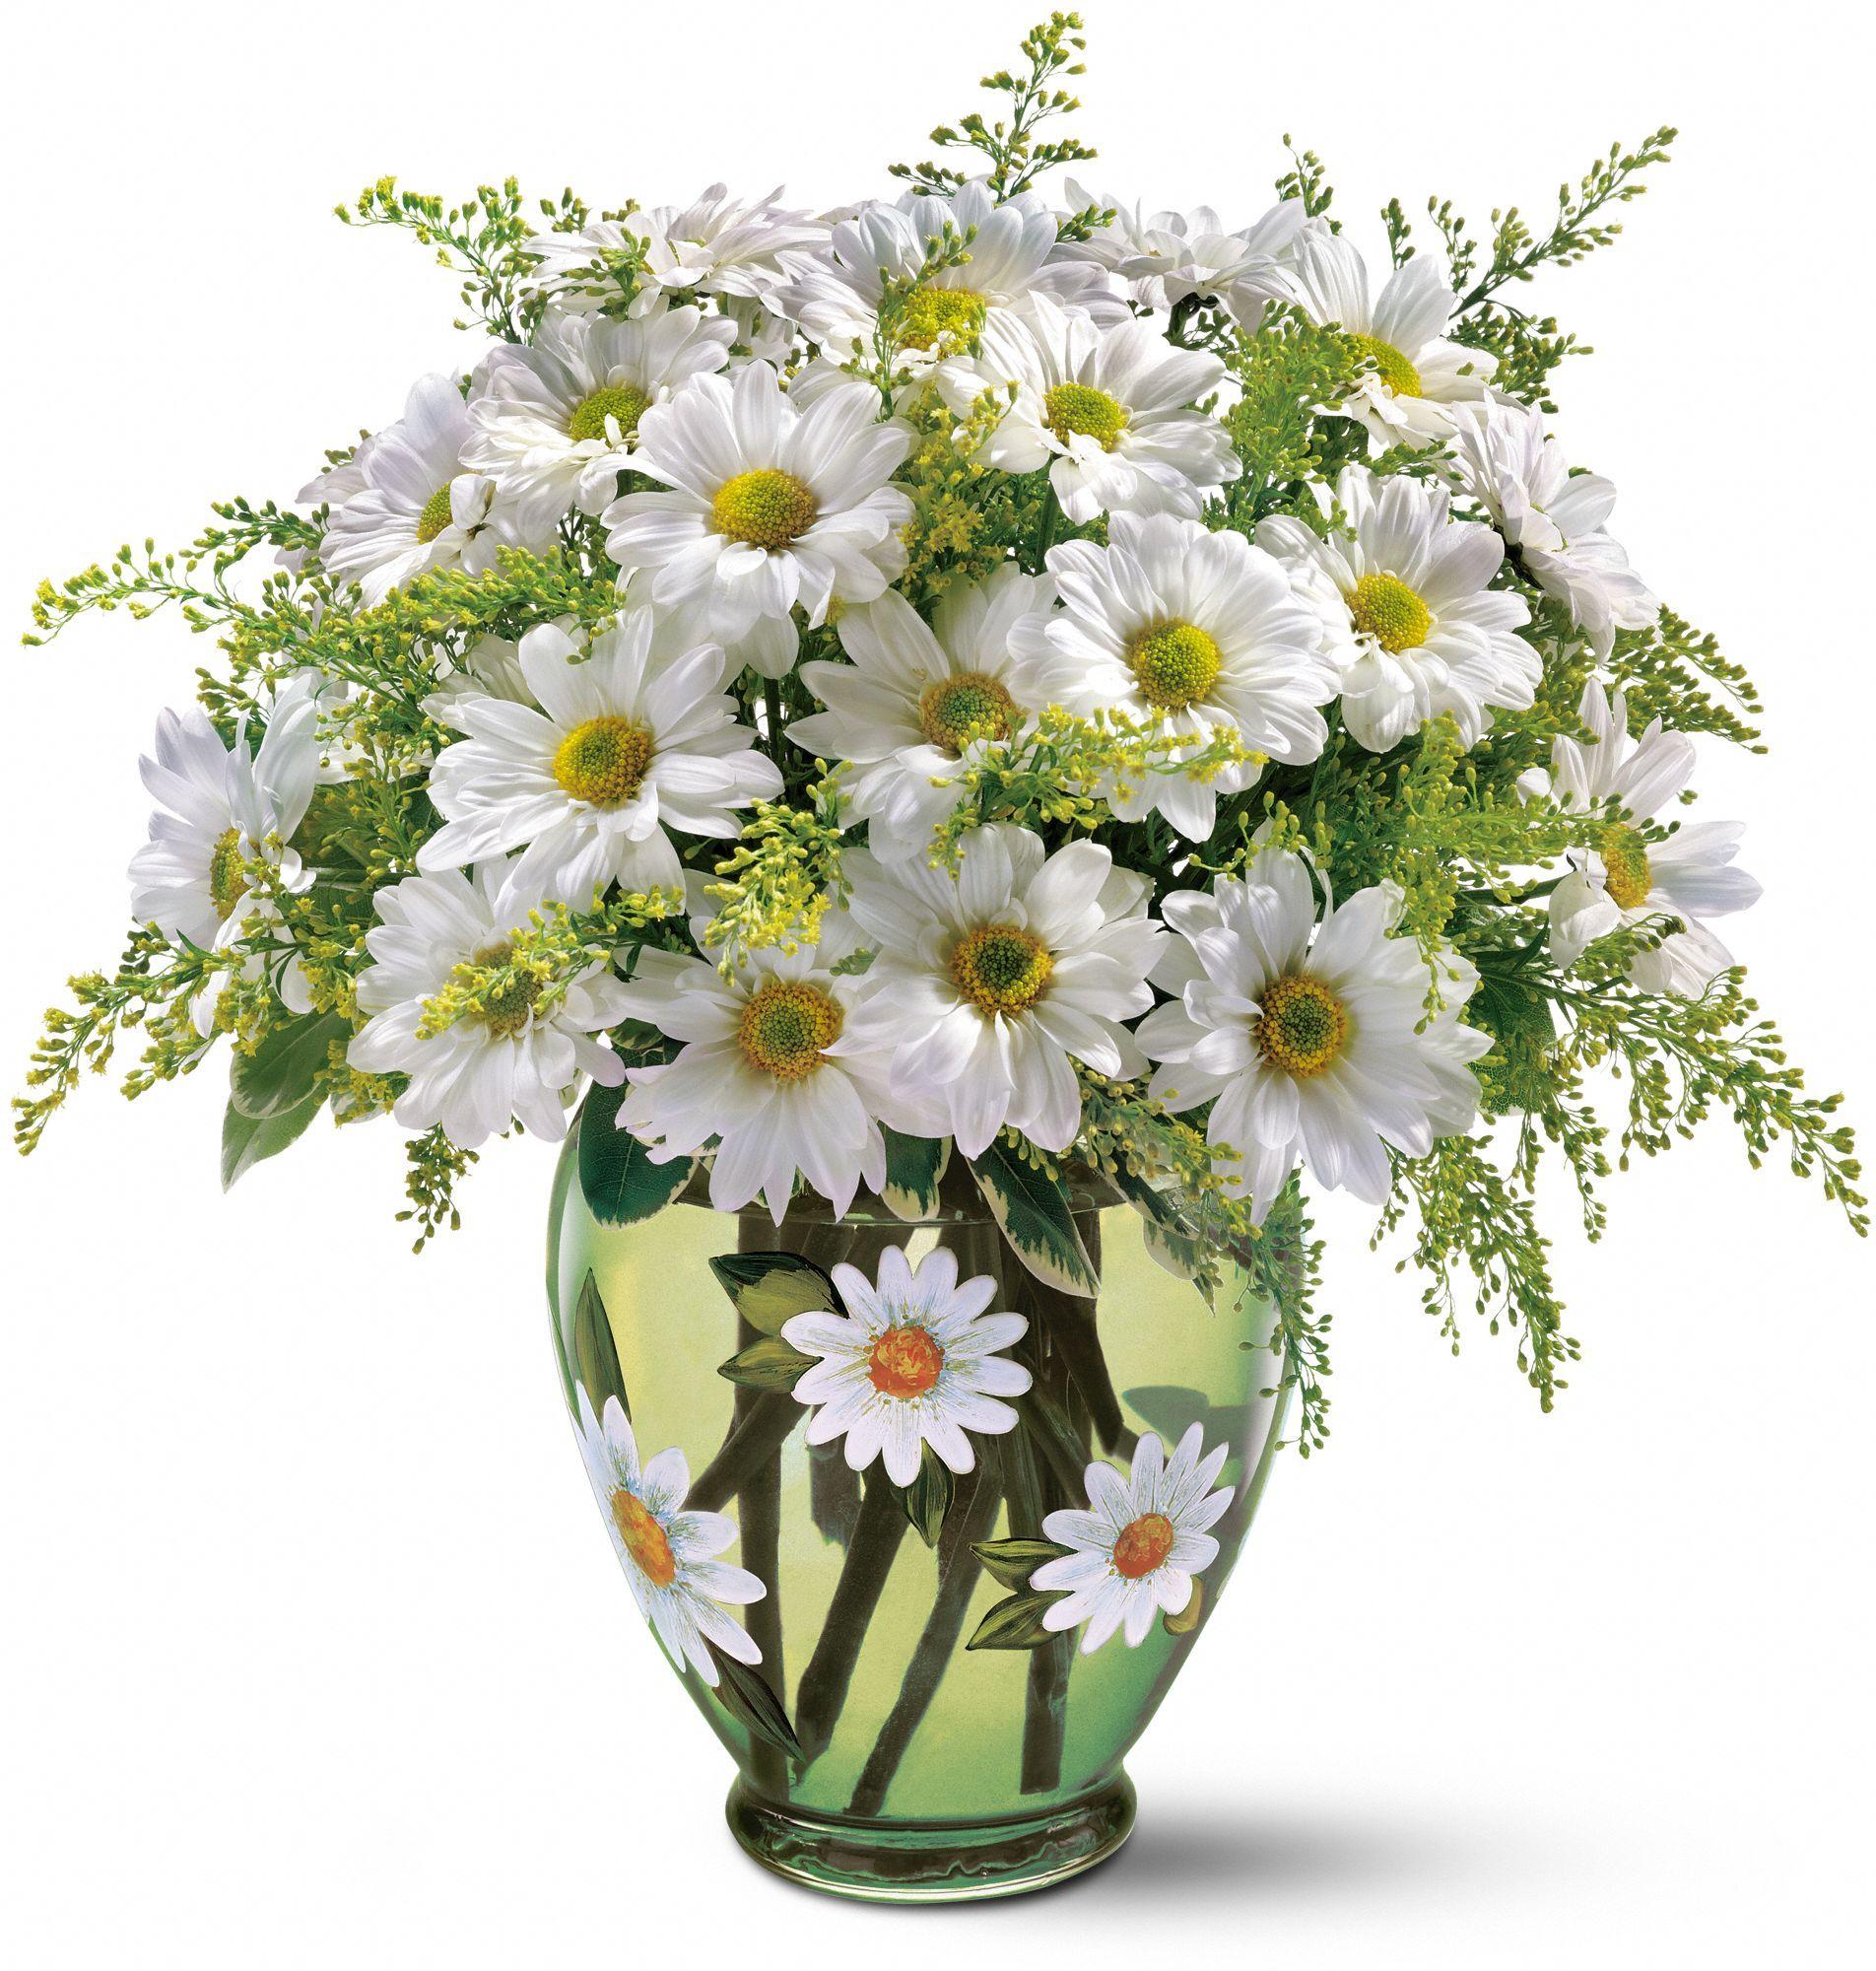 Telefloras crazy for daisies bouquet the vase is a bit much cut flowers dhlflorist Choice Image